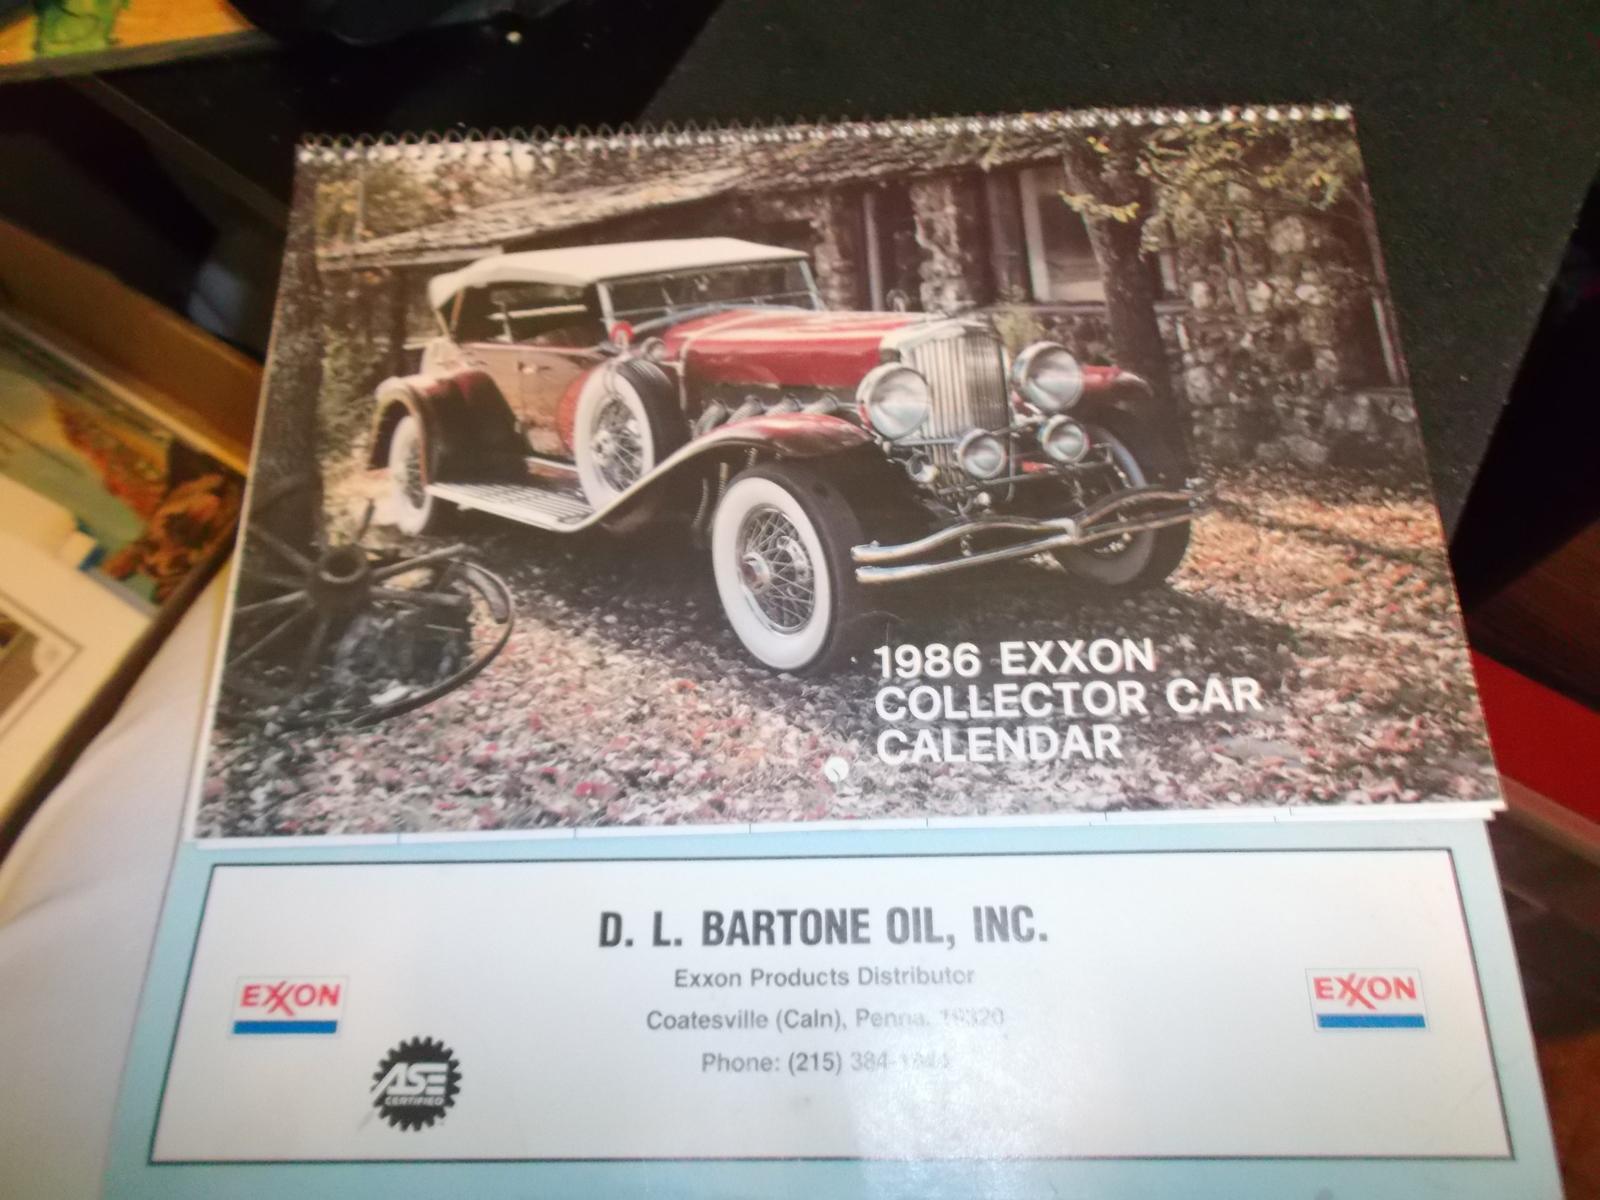 Original 1986 EXXON Collector Car Calendar and similar items